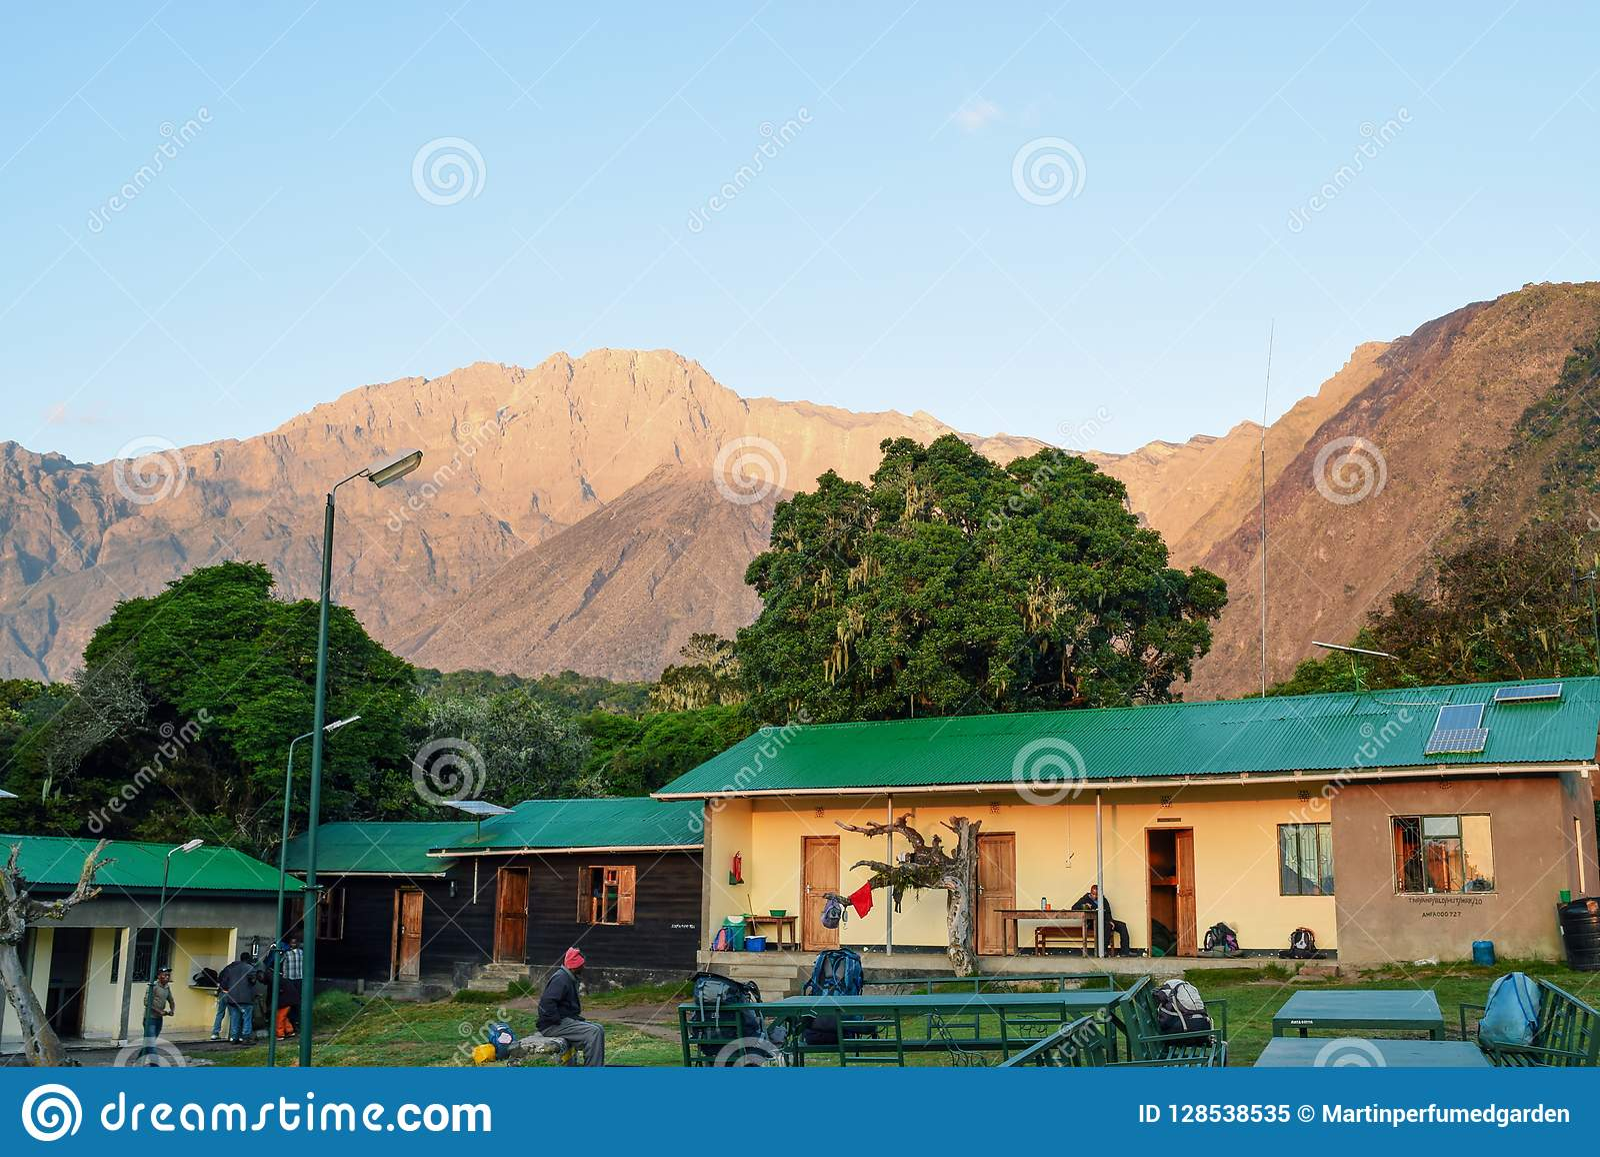 Mariakamba Hut Mount Meru, Arusha National Park